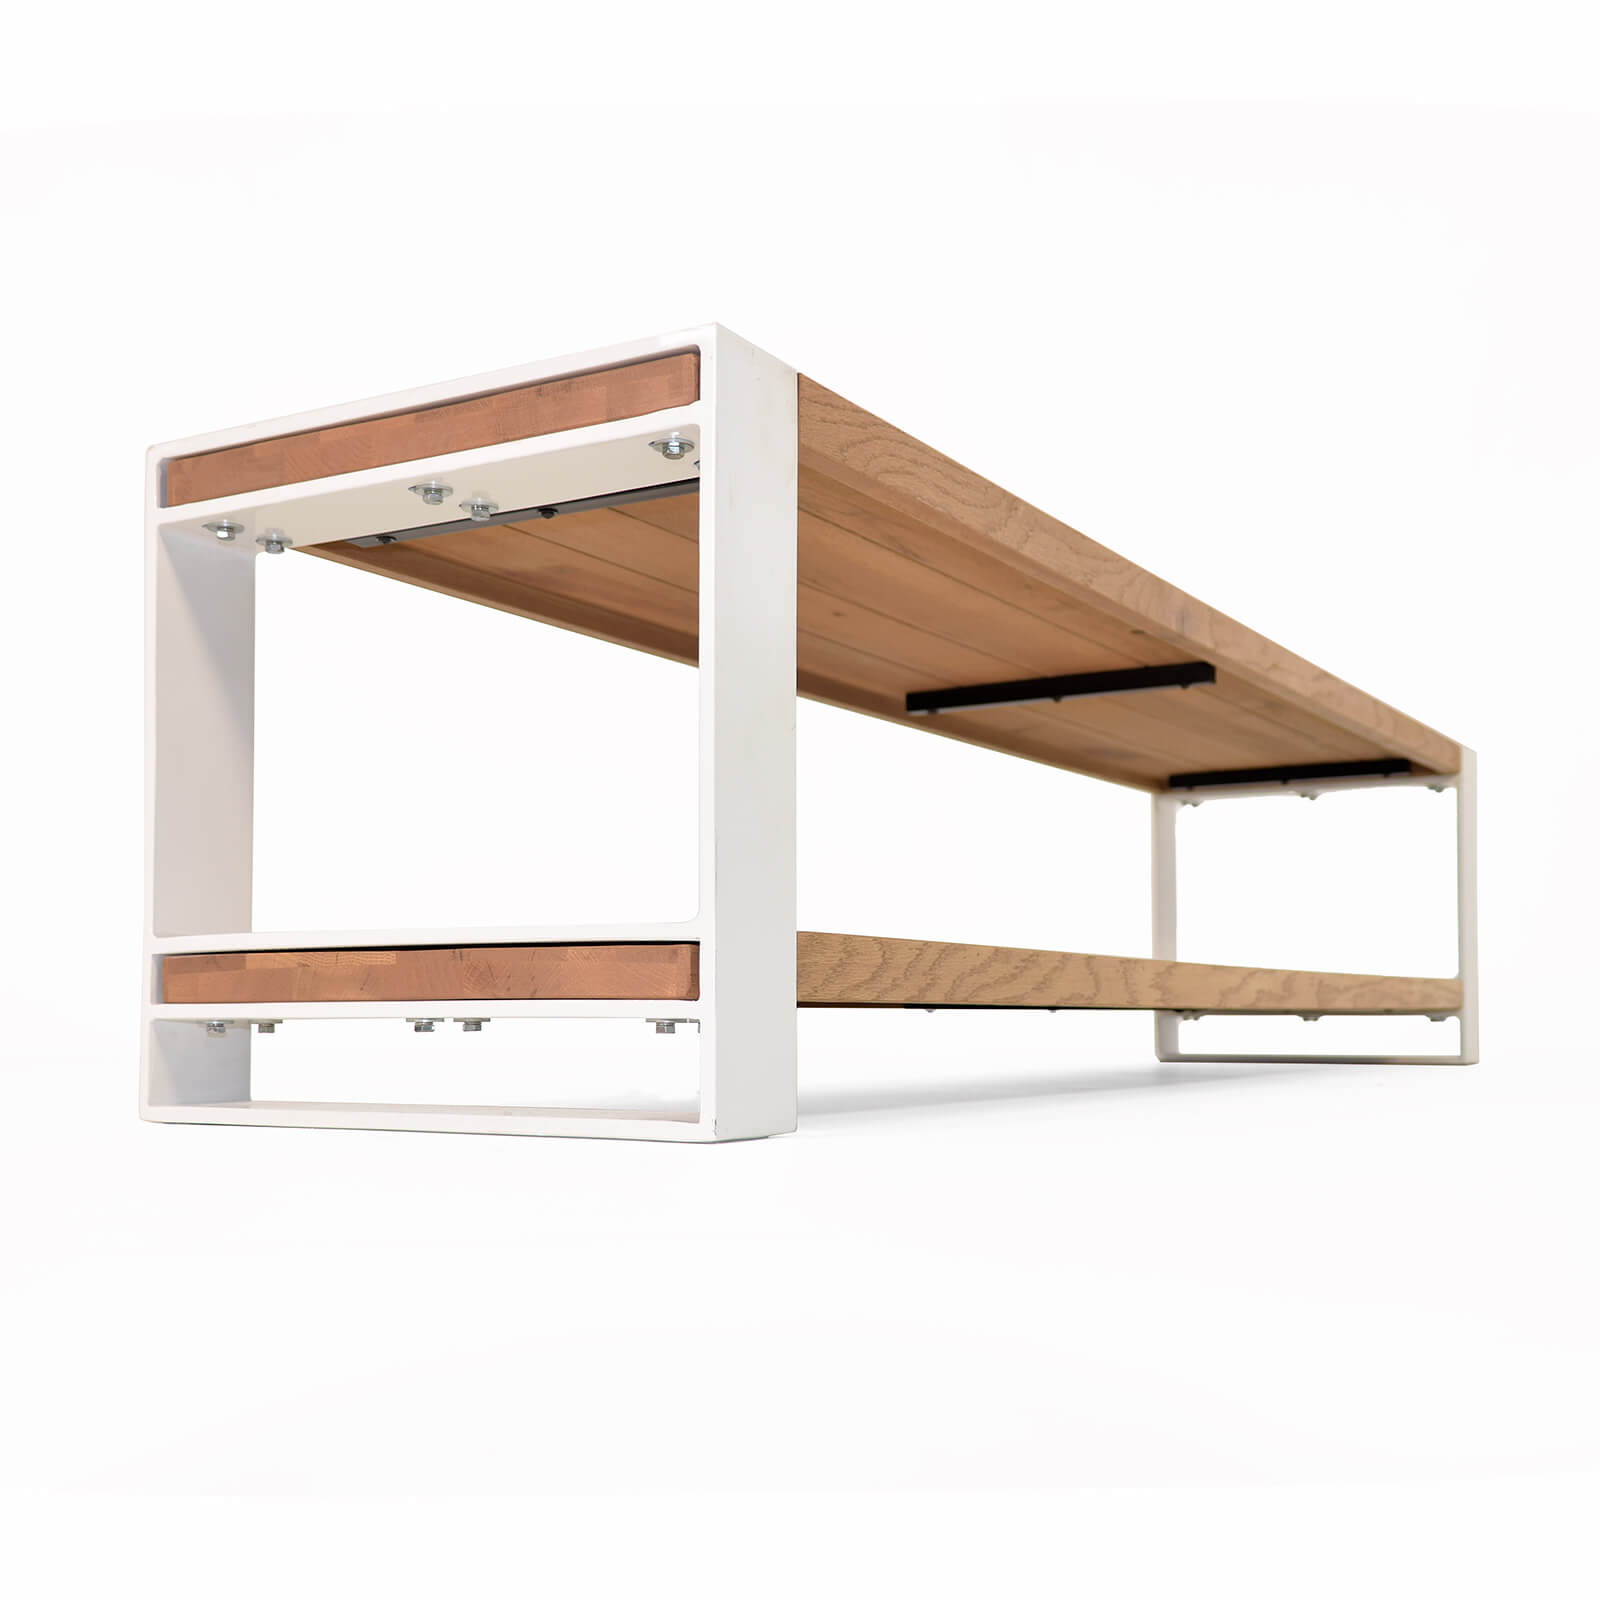 lowboard mio eiche massivholz metall wei 180cm. Black Bedroom Furniture Sets. Home Design Ideas